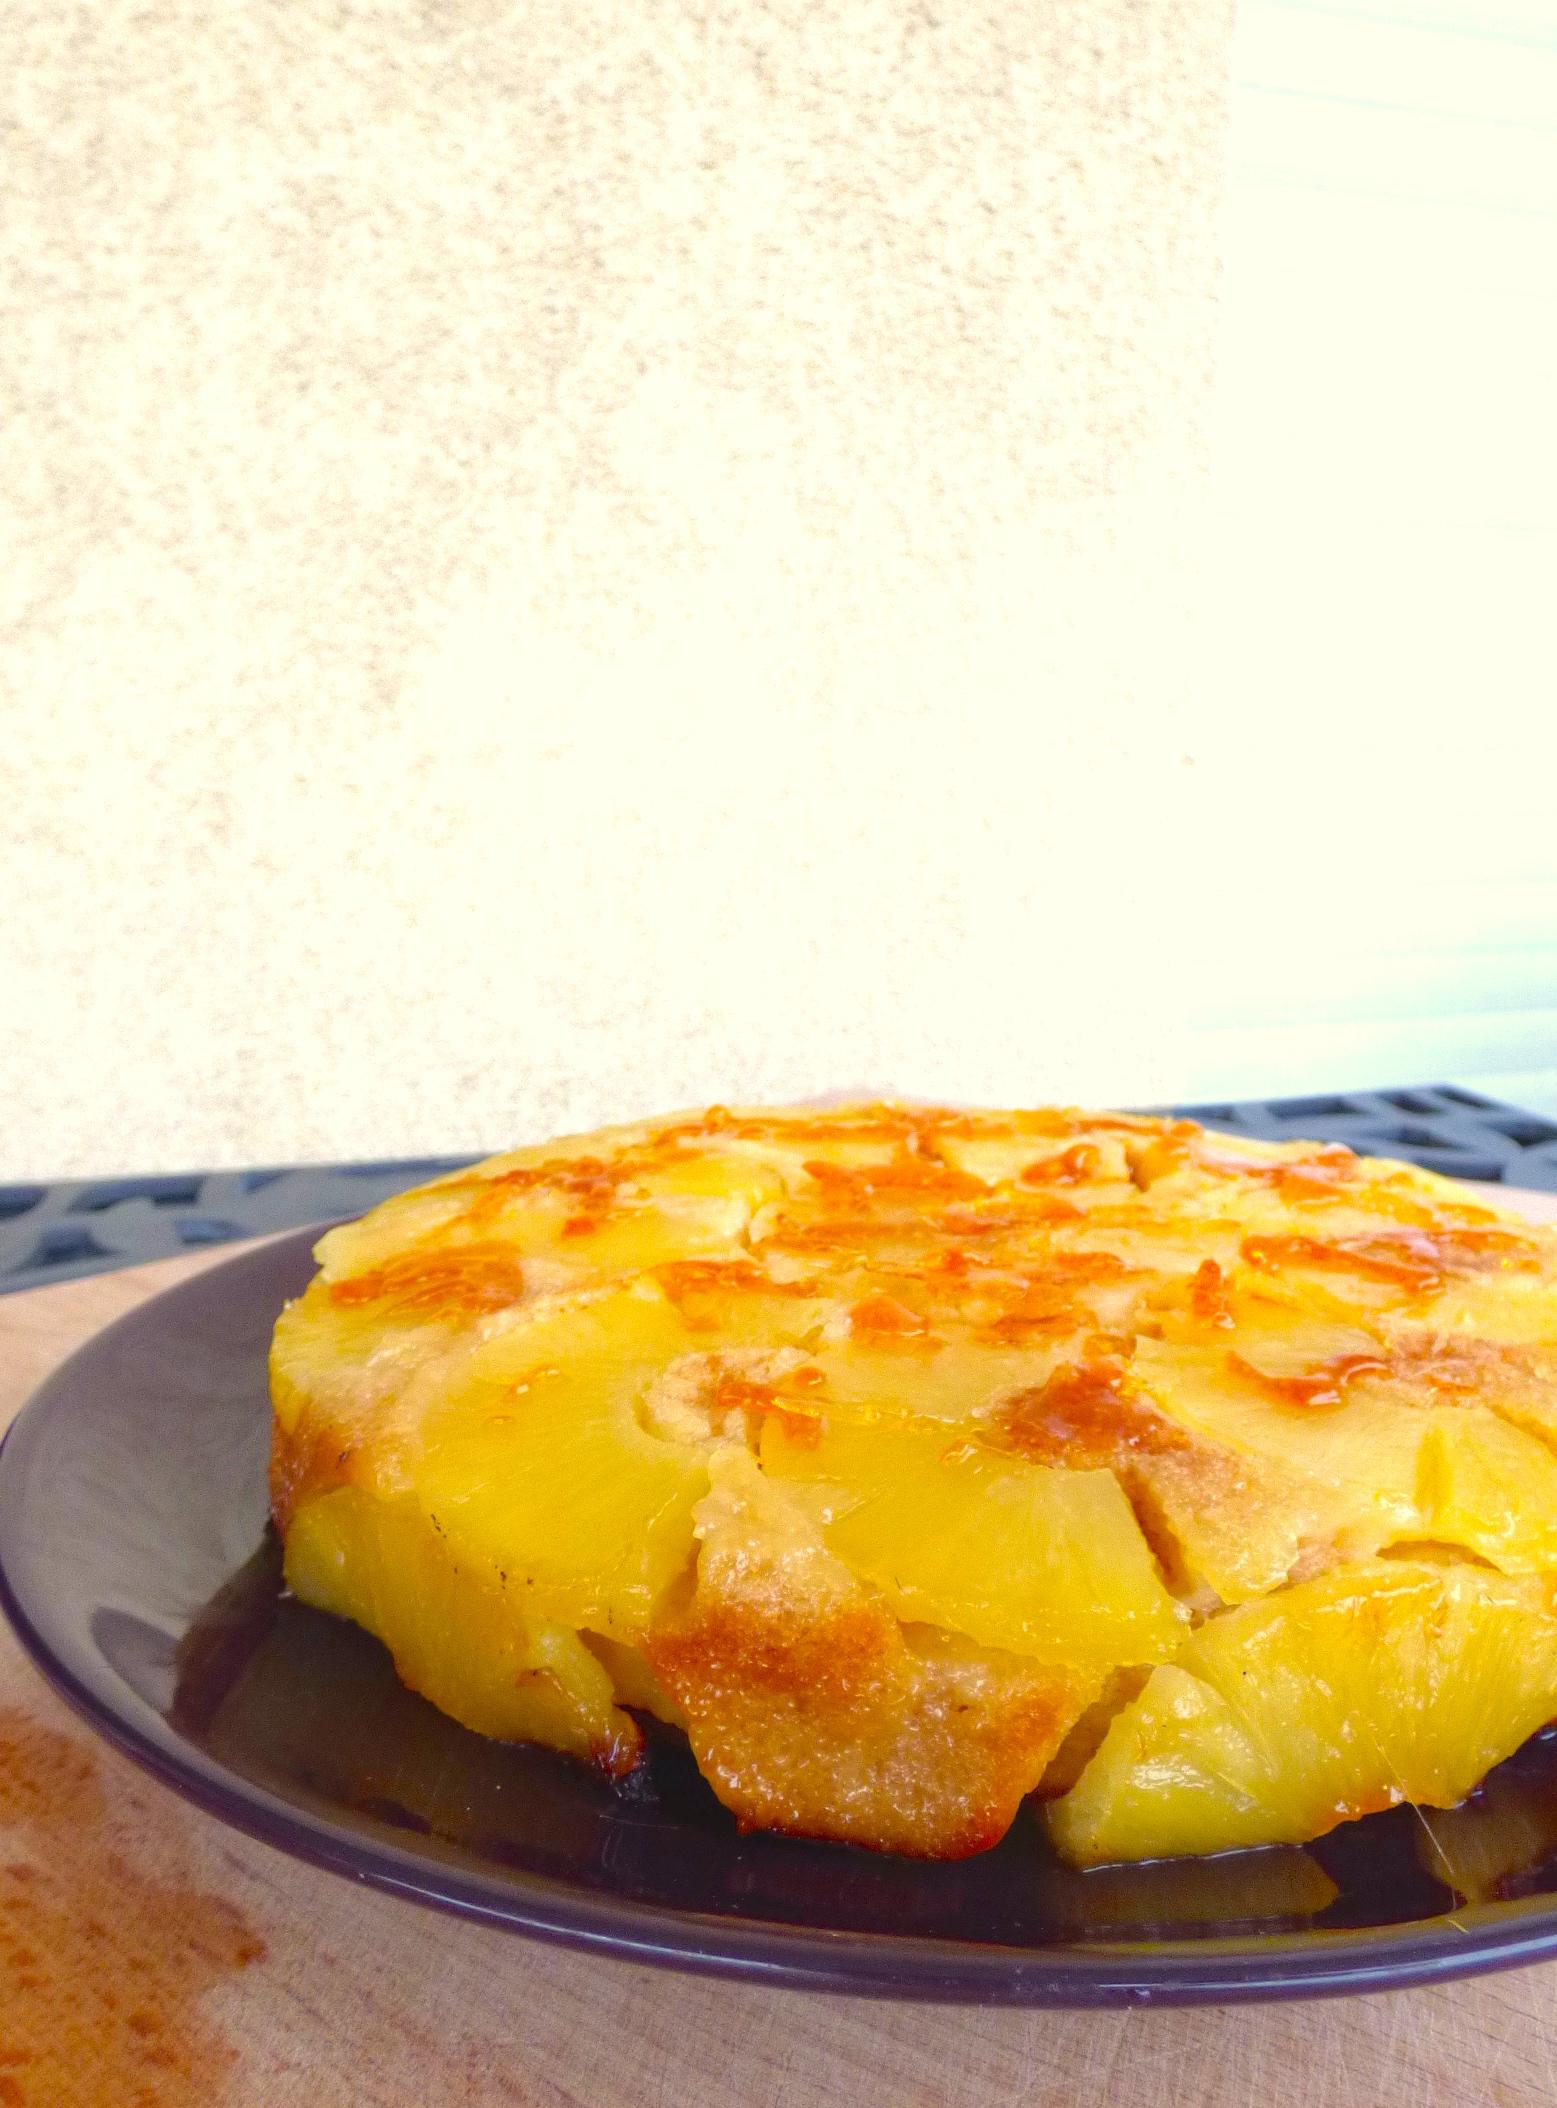 gateau rhum ananas